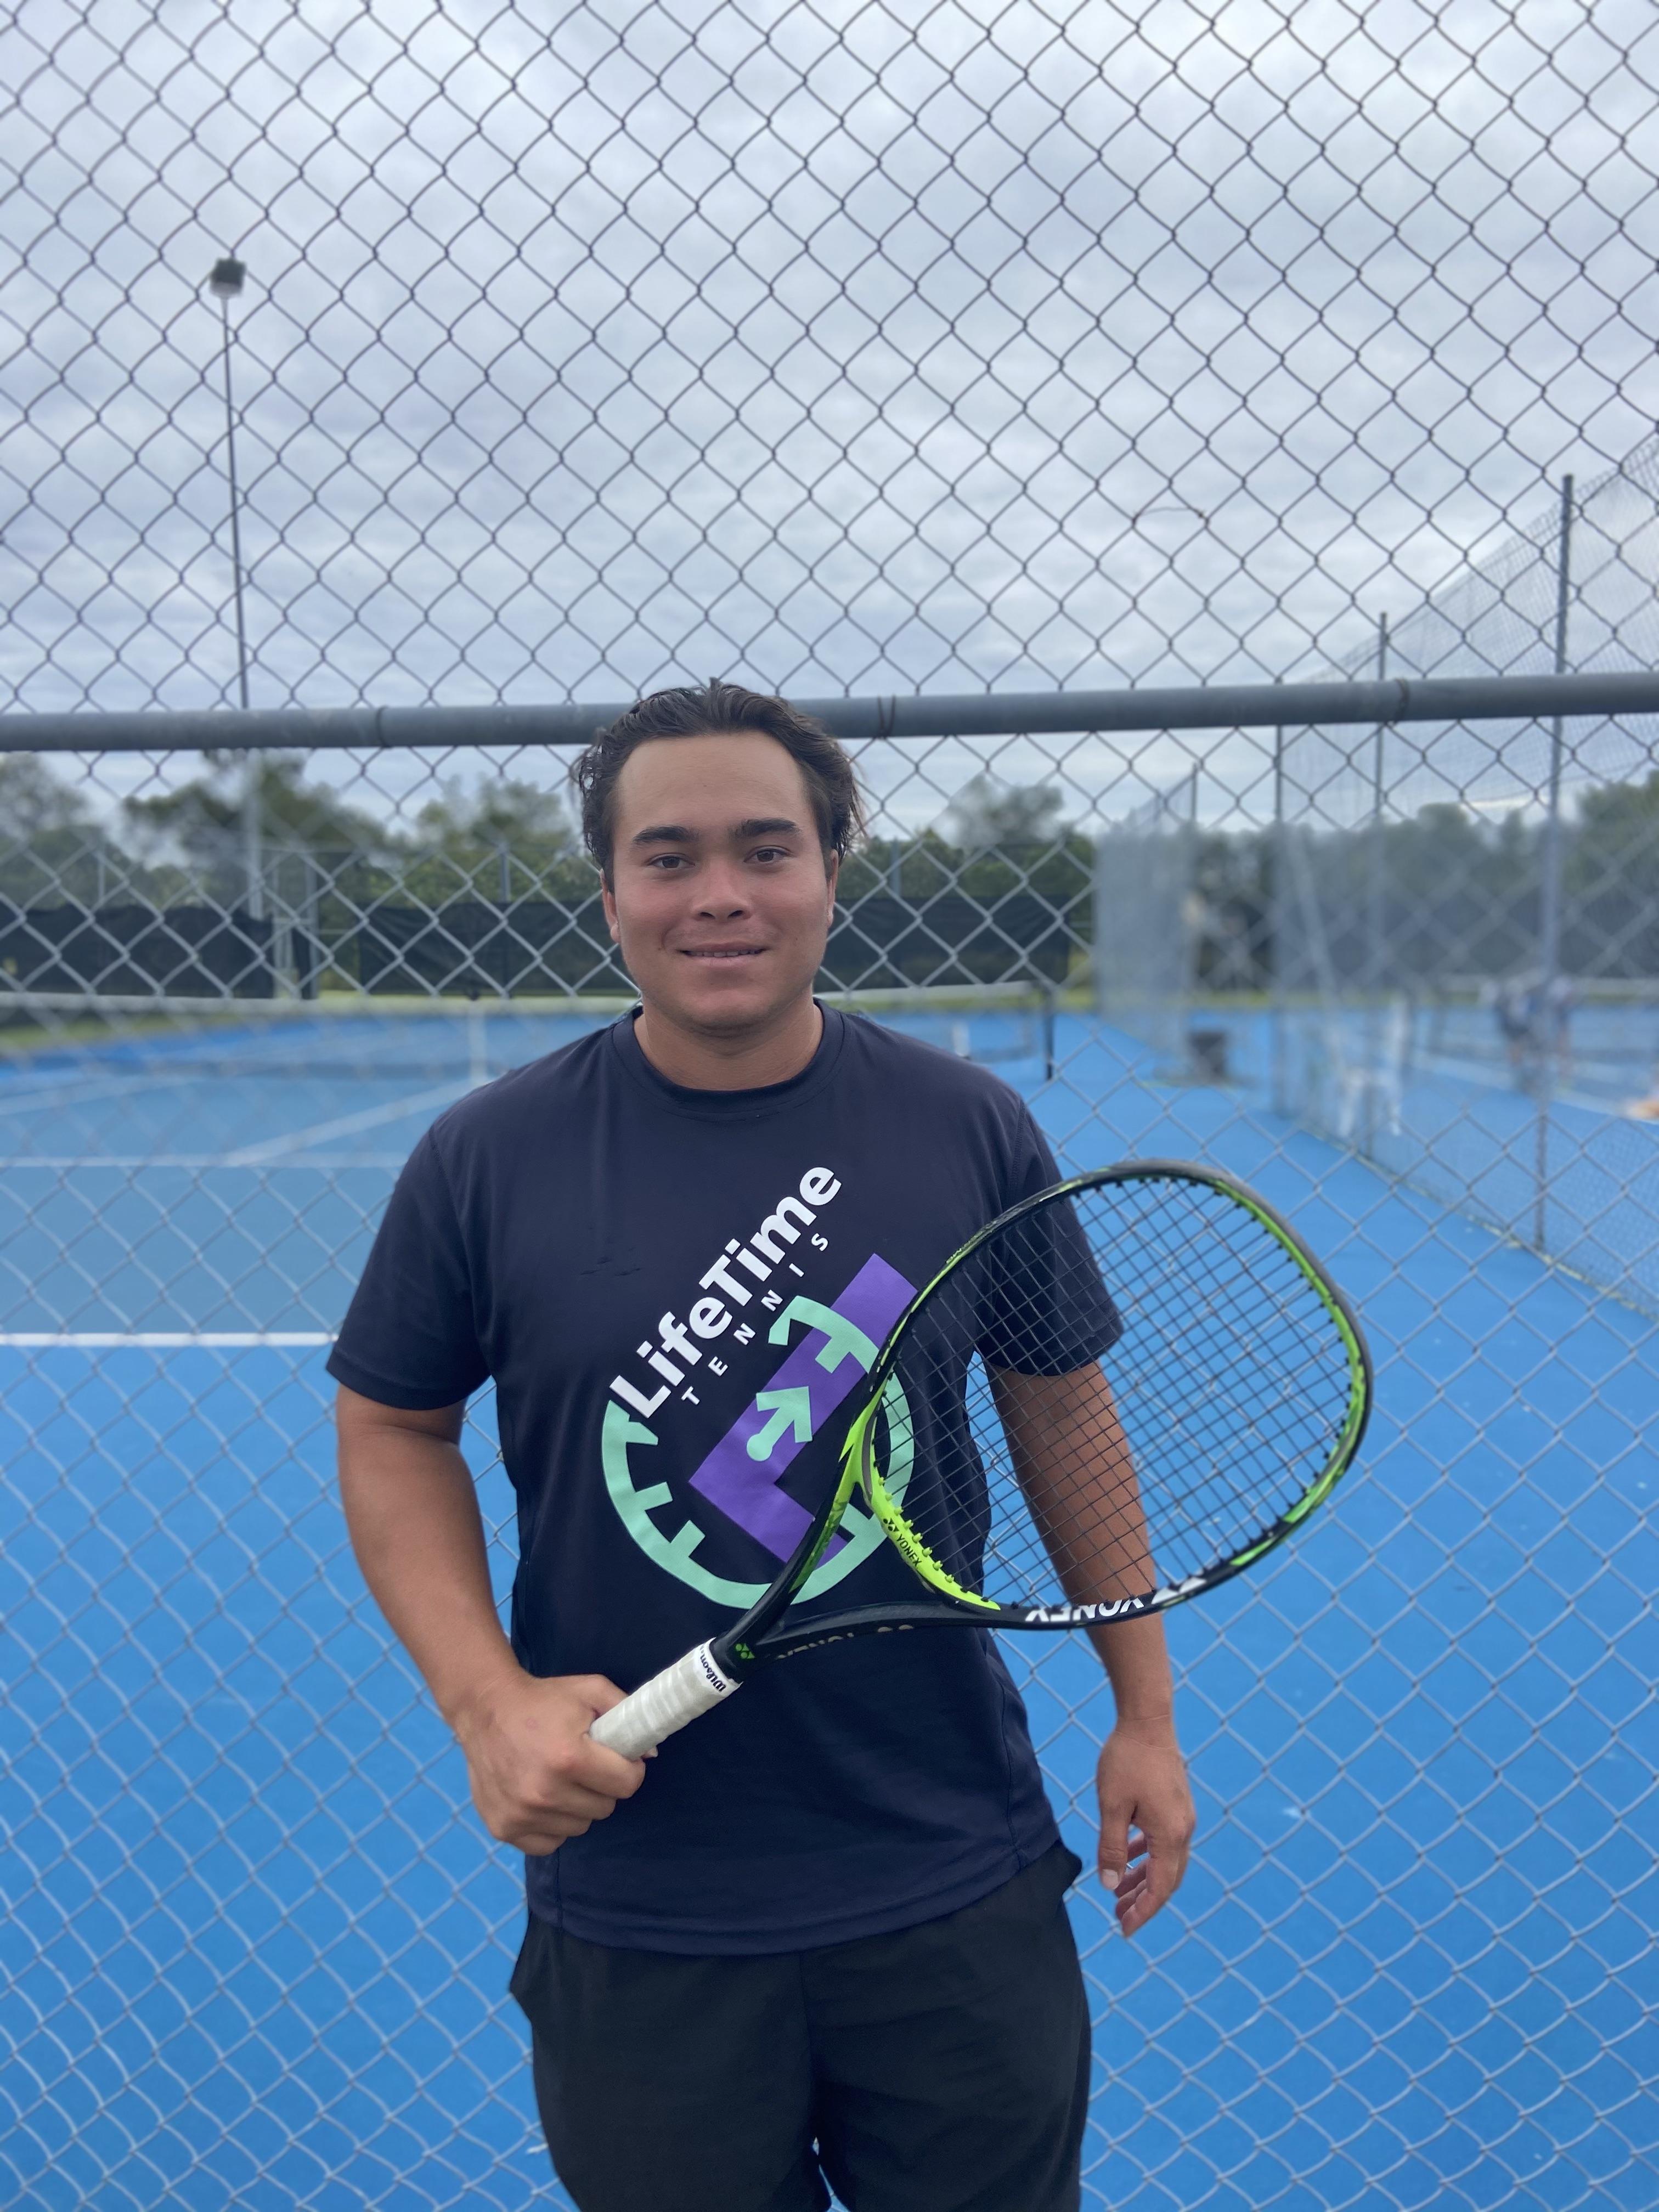 The LifeTime Tennis Team: Jack Moore